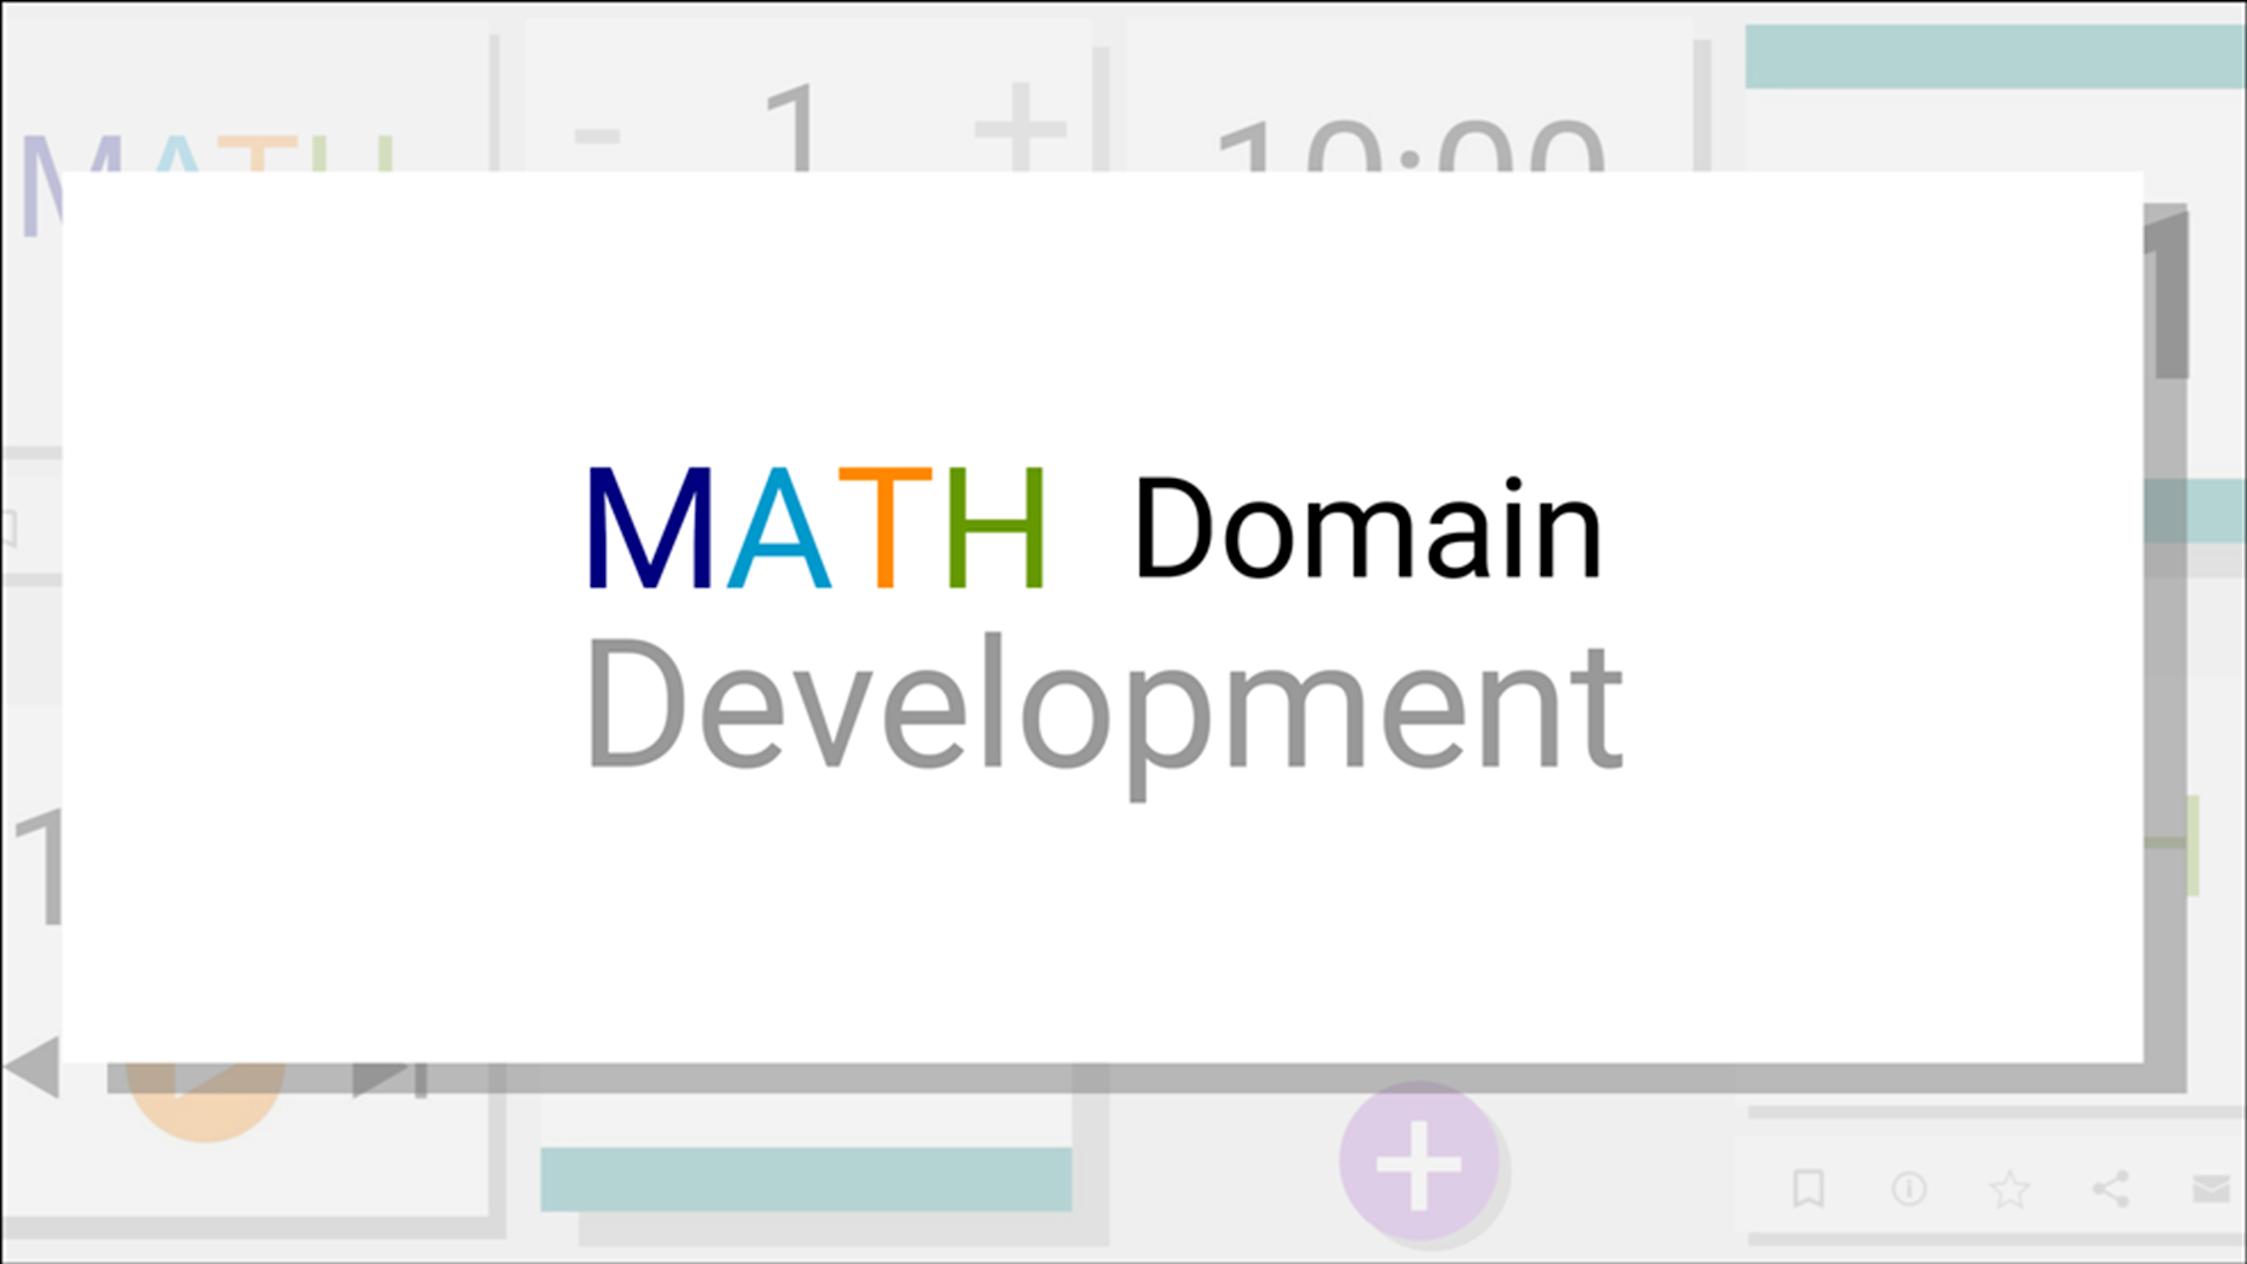 MATH Domain Development